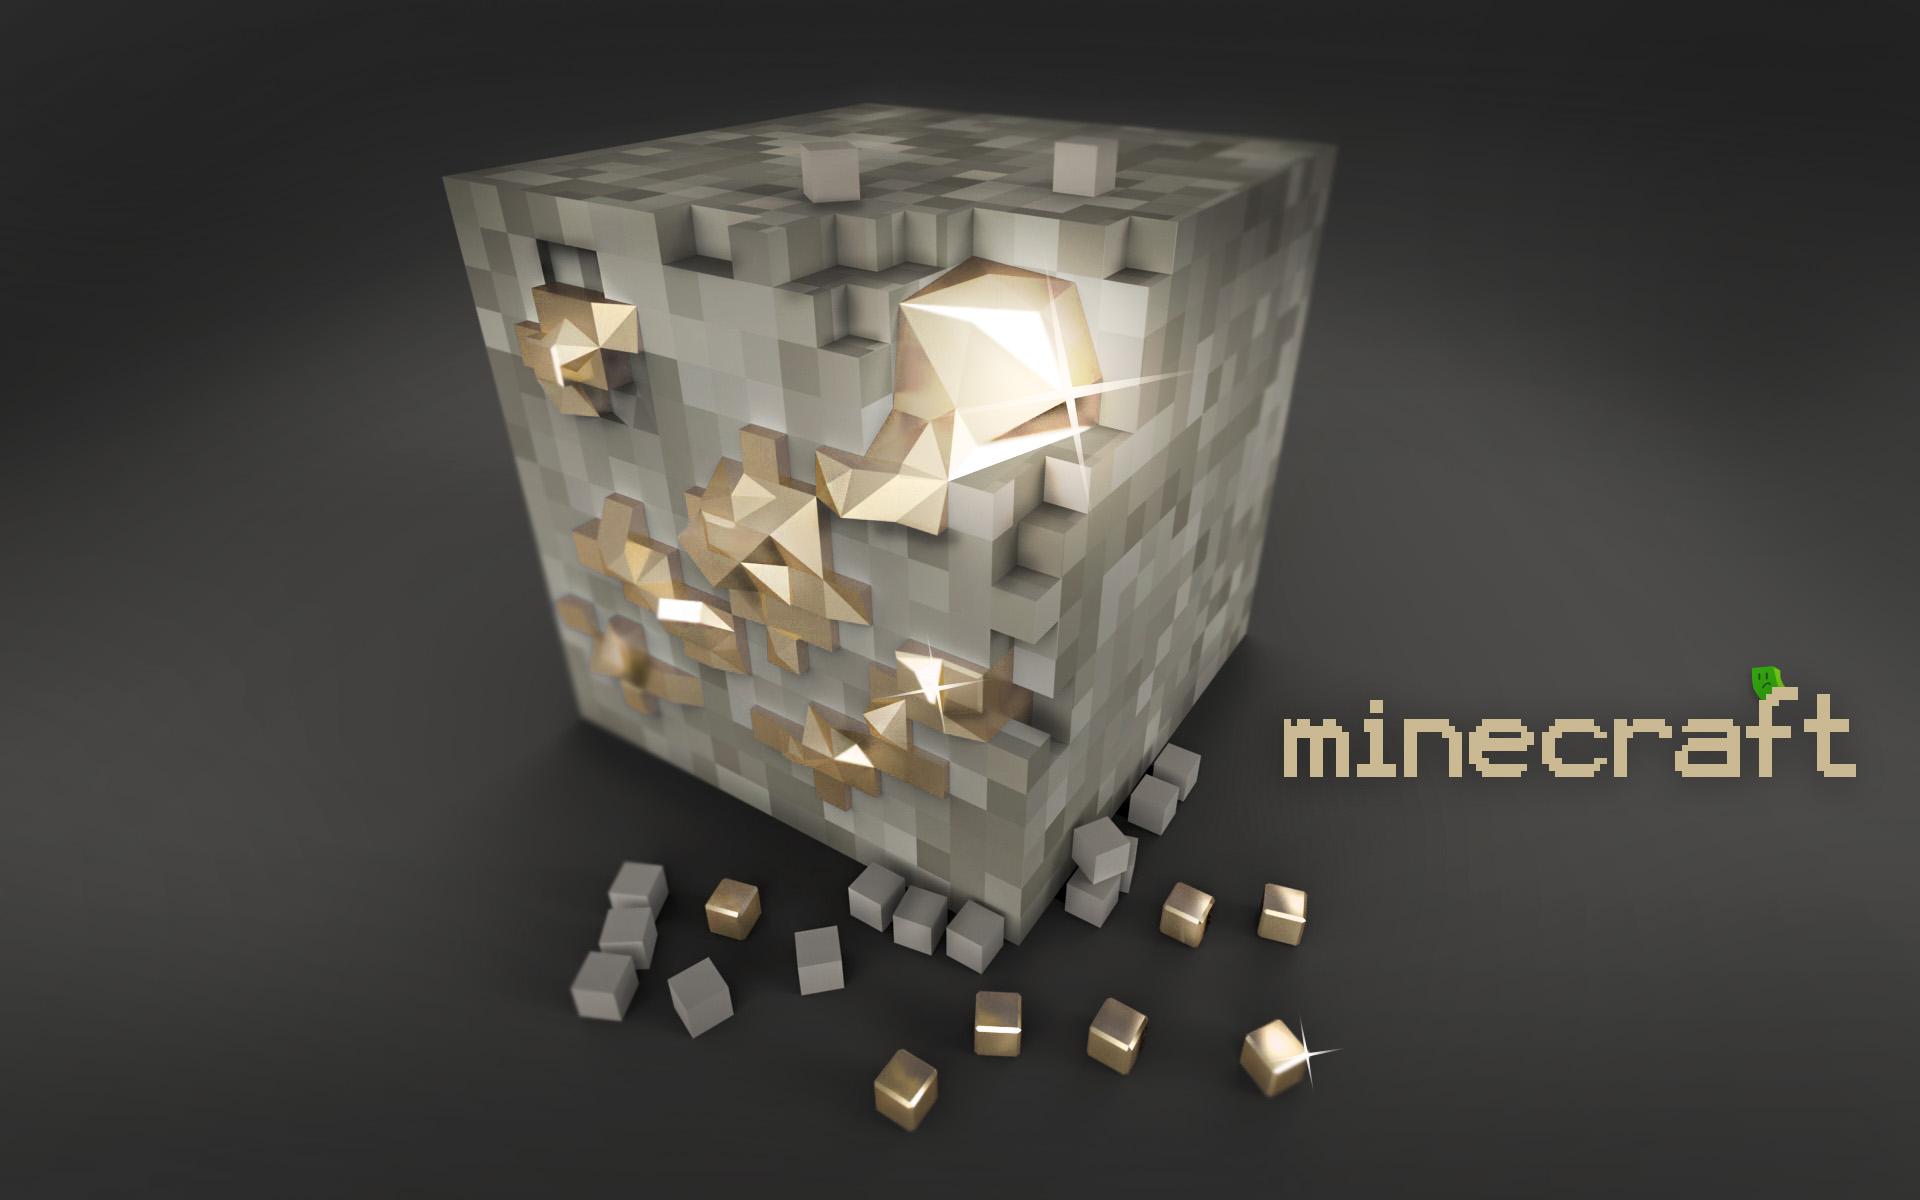 hinh nen minecraft 17